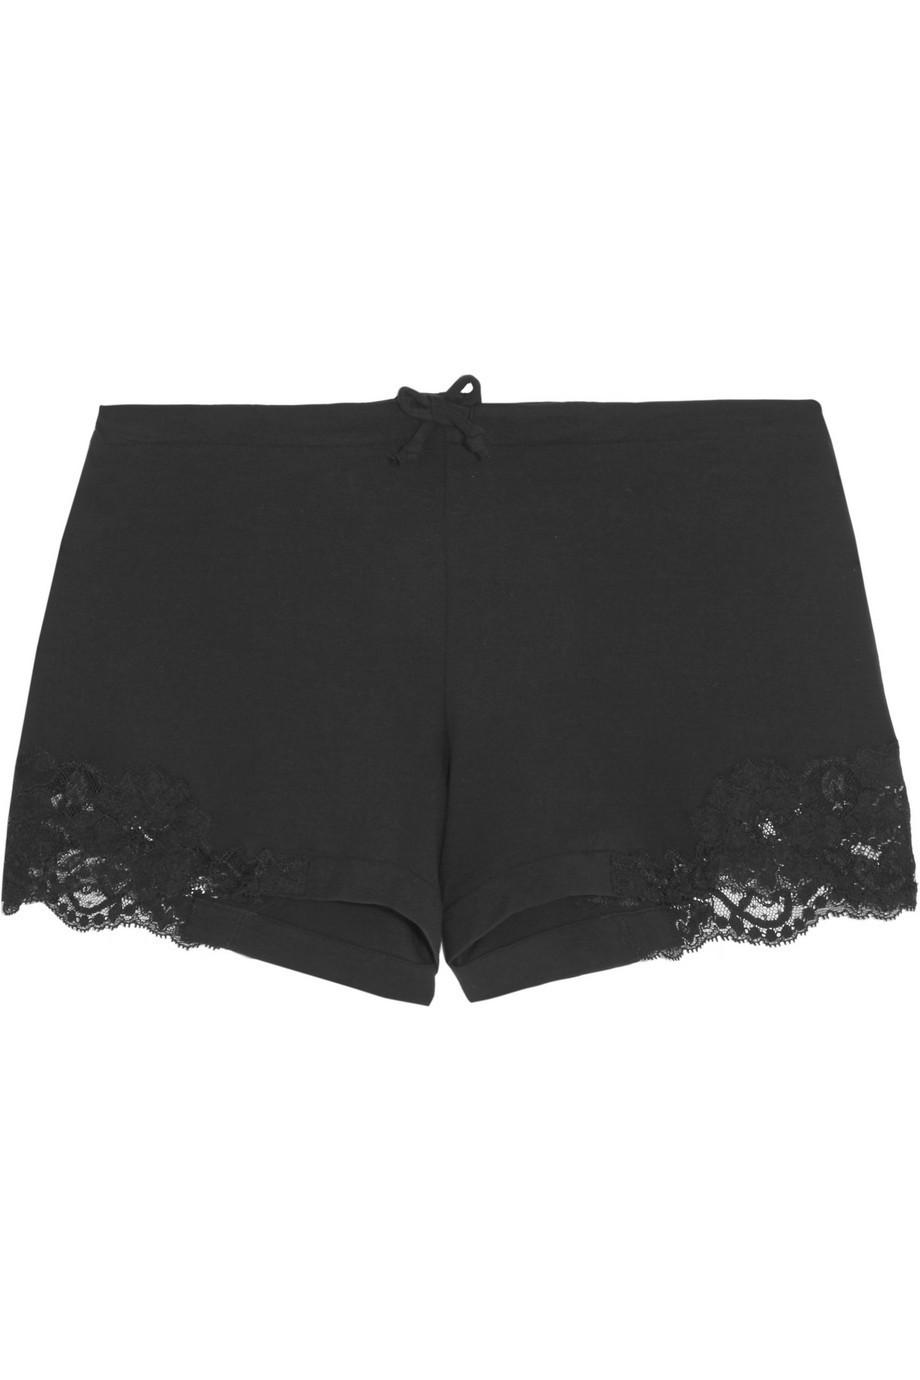 La Perla Souple Lace-Trimmed Stretch-Cotton Jersey Pajama Shorts in black